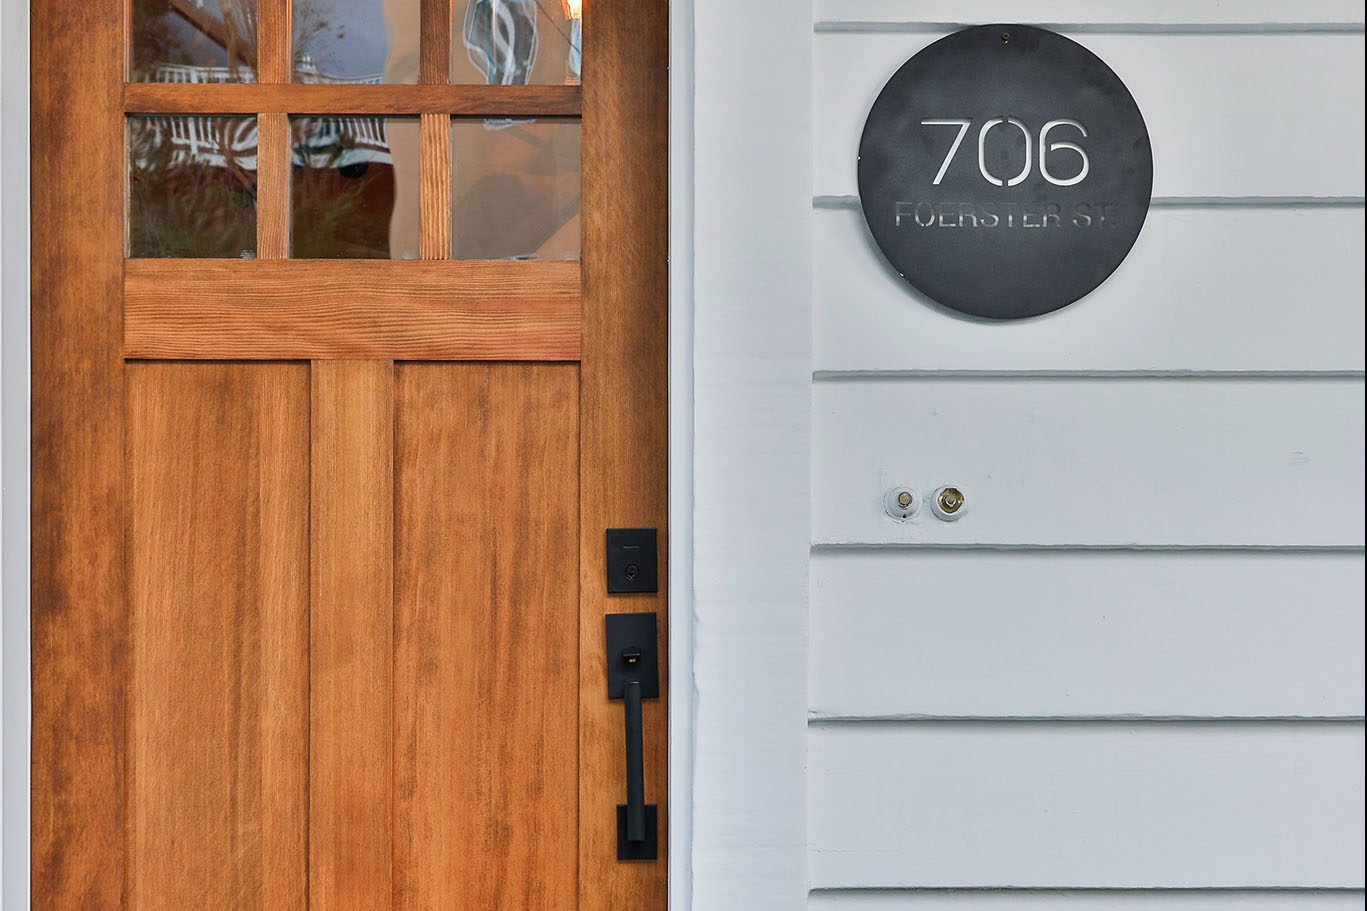 San Francisco Real Estate - front door details